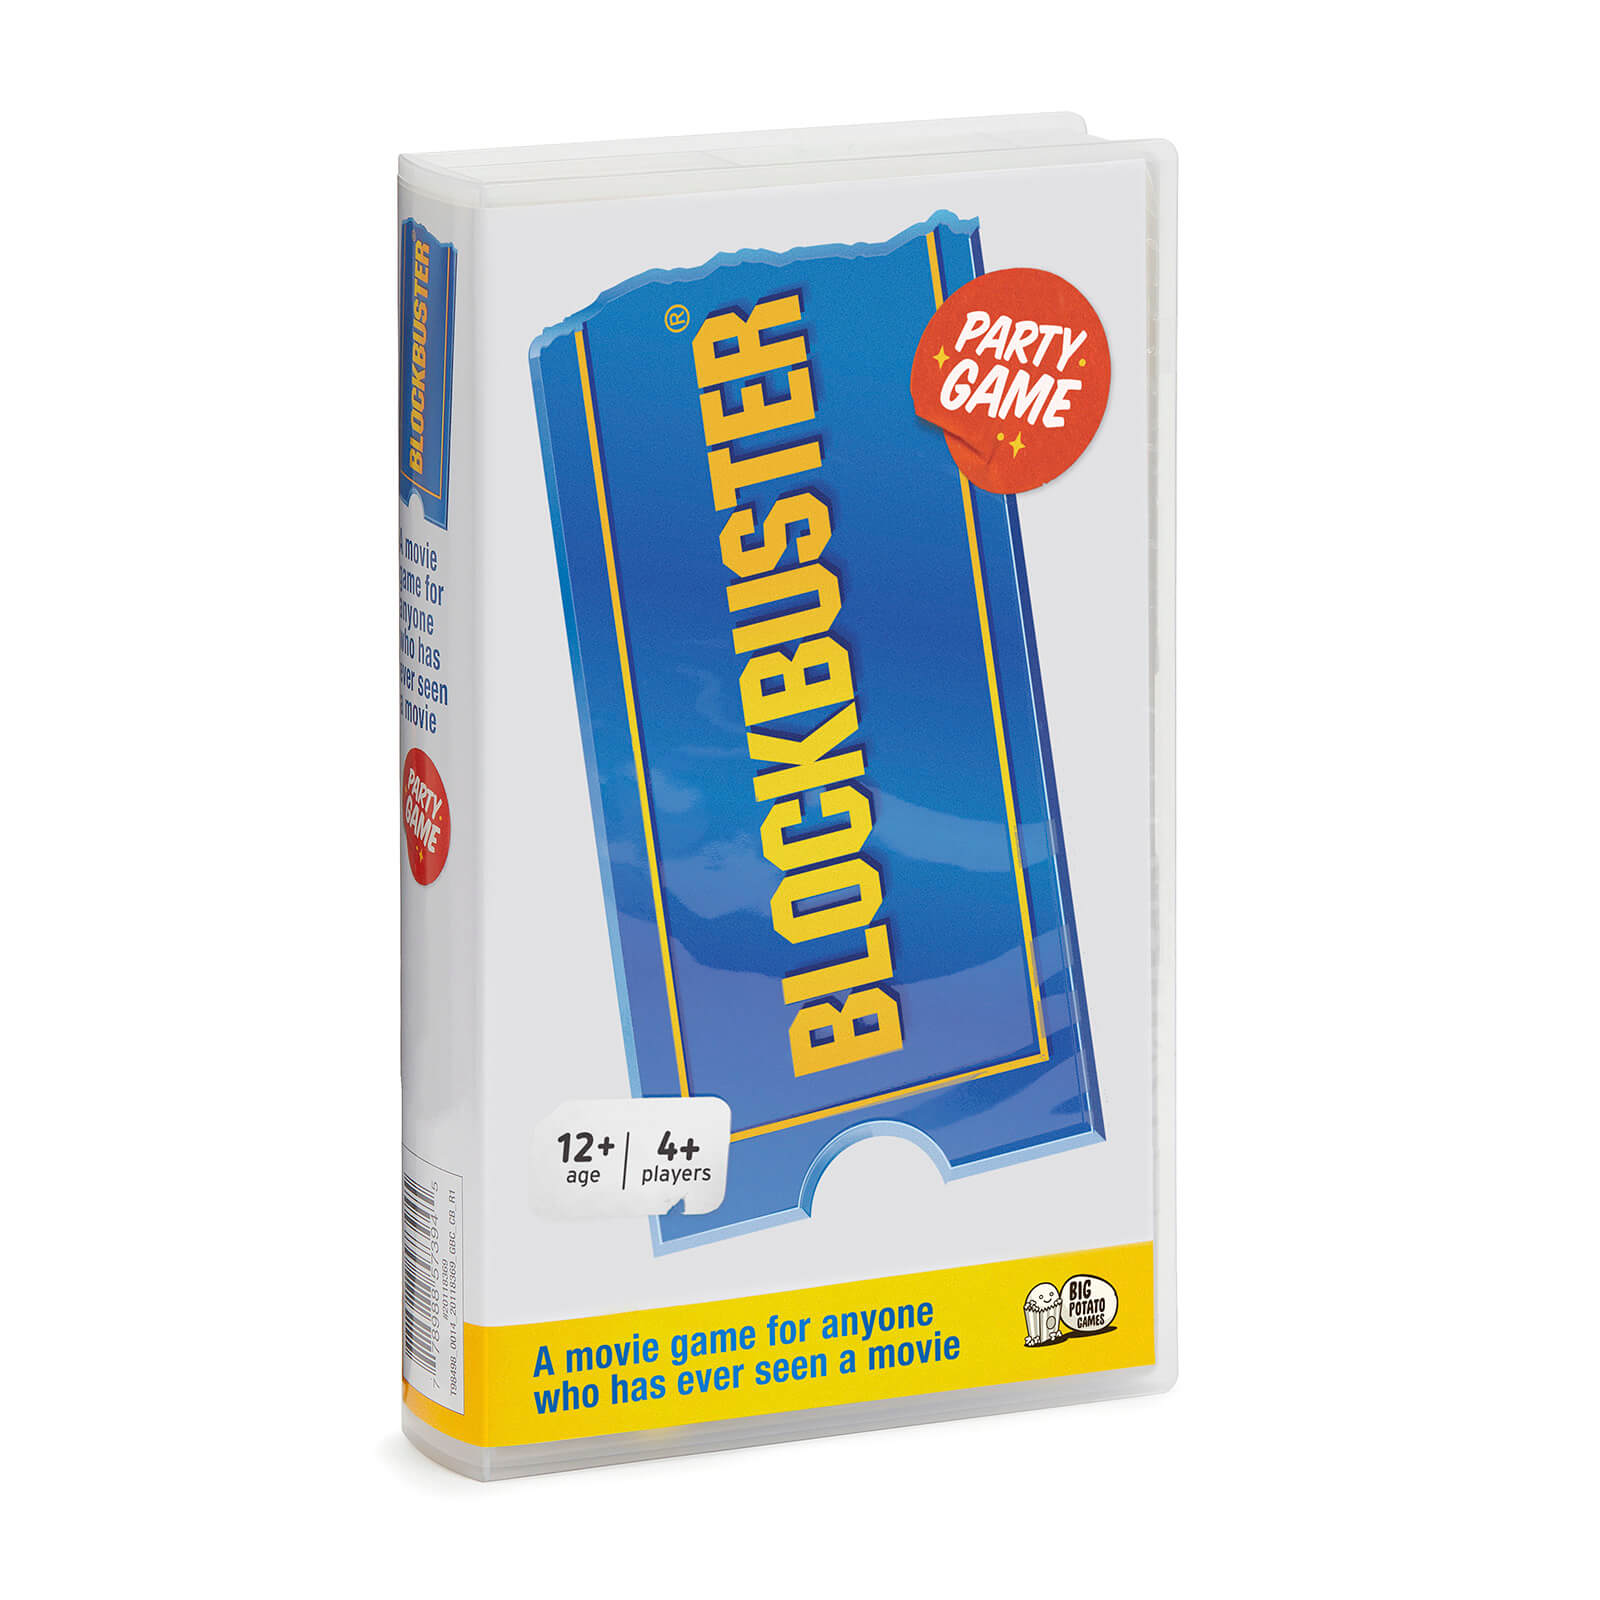 Image of Blockbuster Game